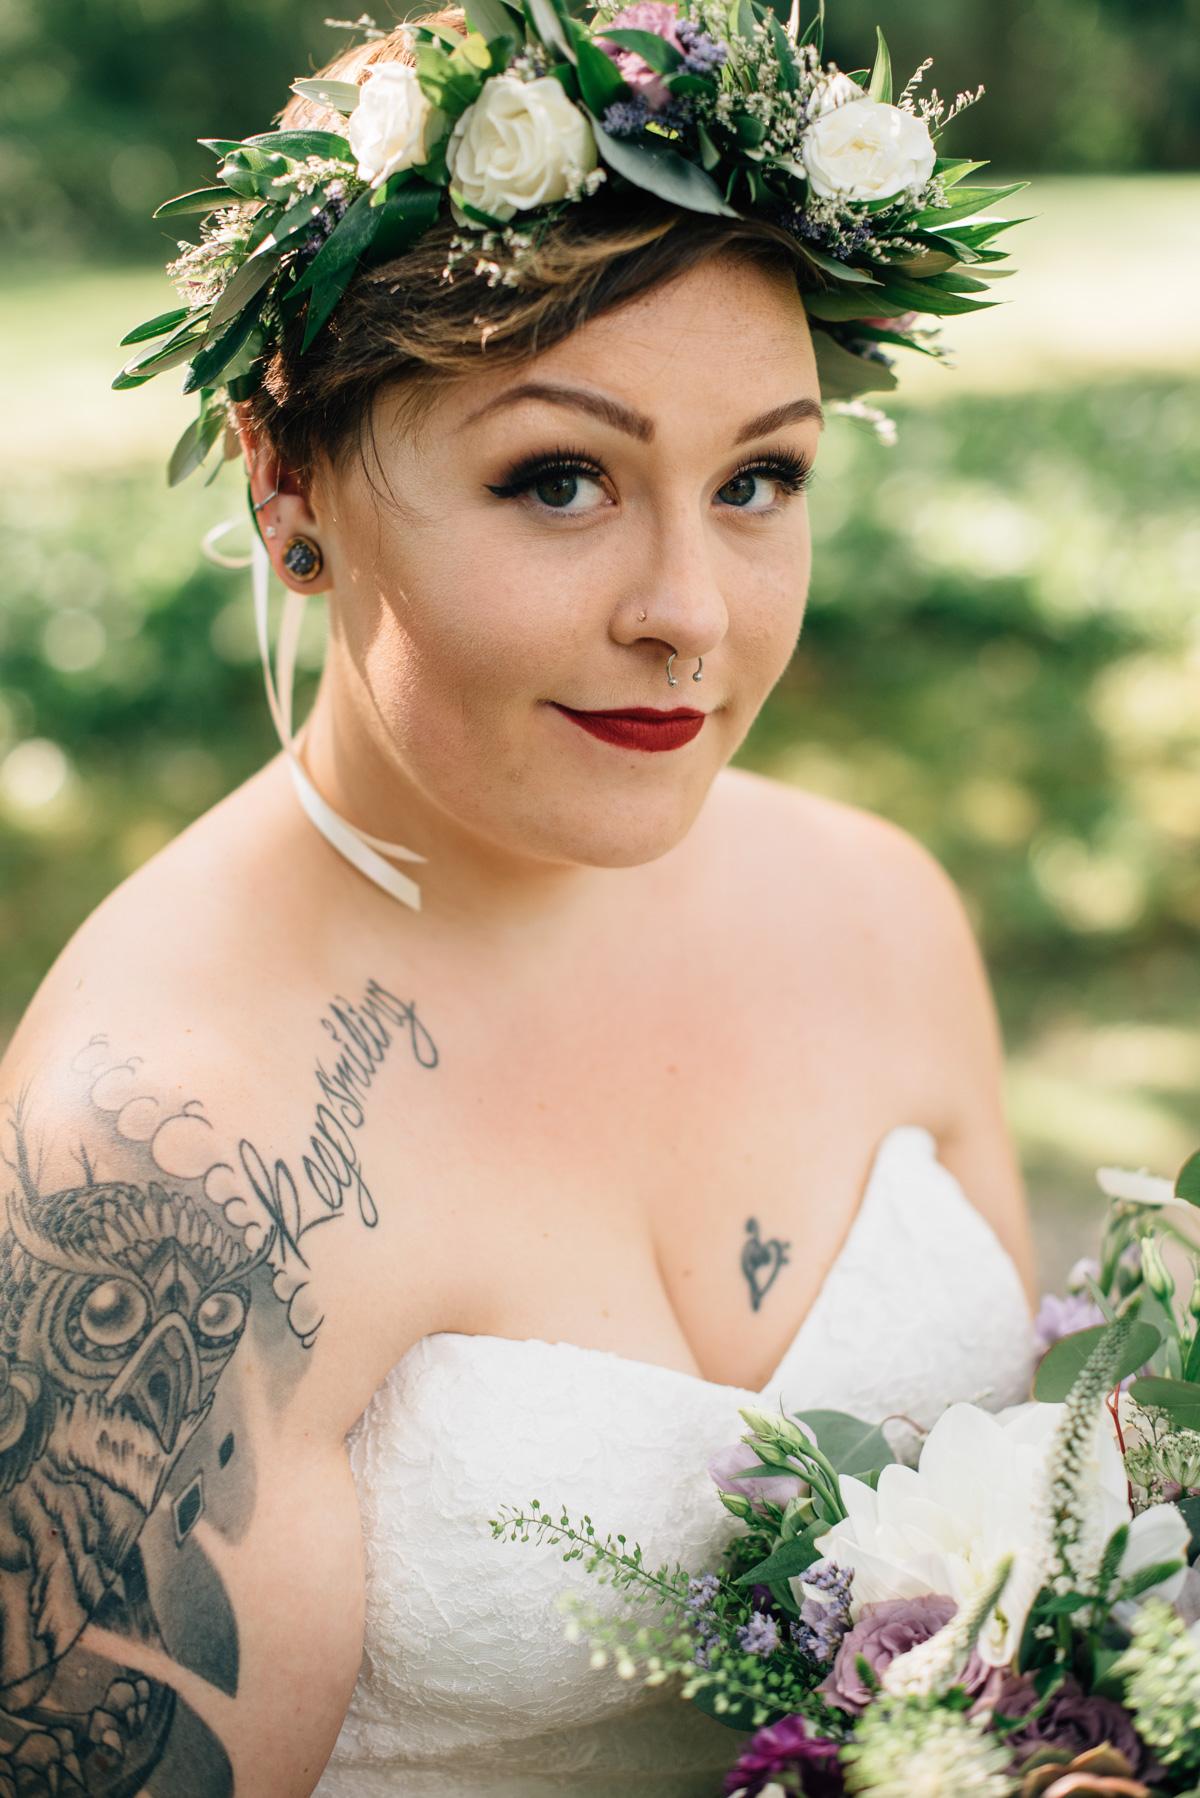 sara-wilde-photography-vineyard-bride-swish-list-beamer-falls-manor-grimsby-wedding-45.jpg